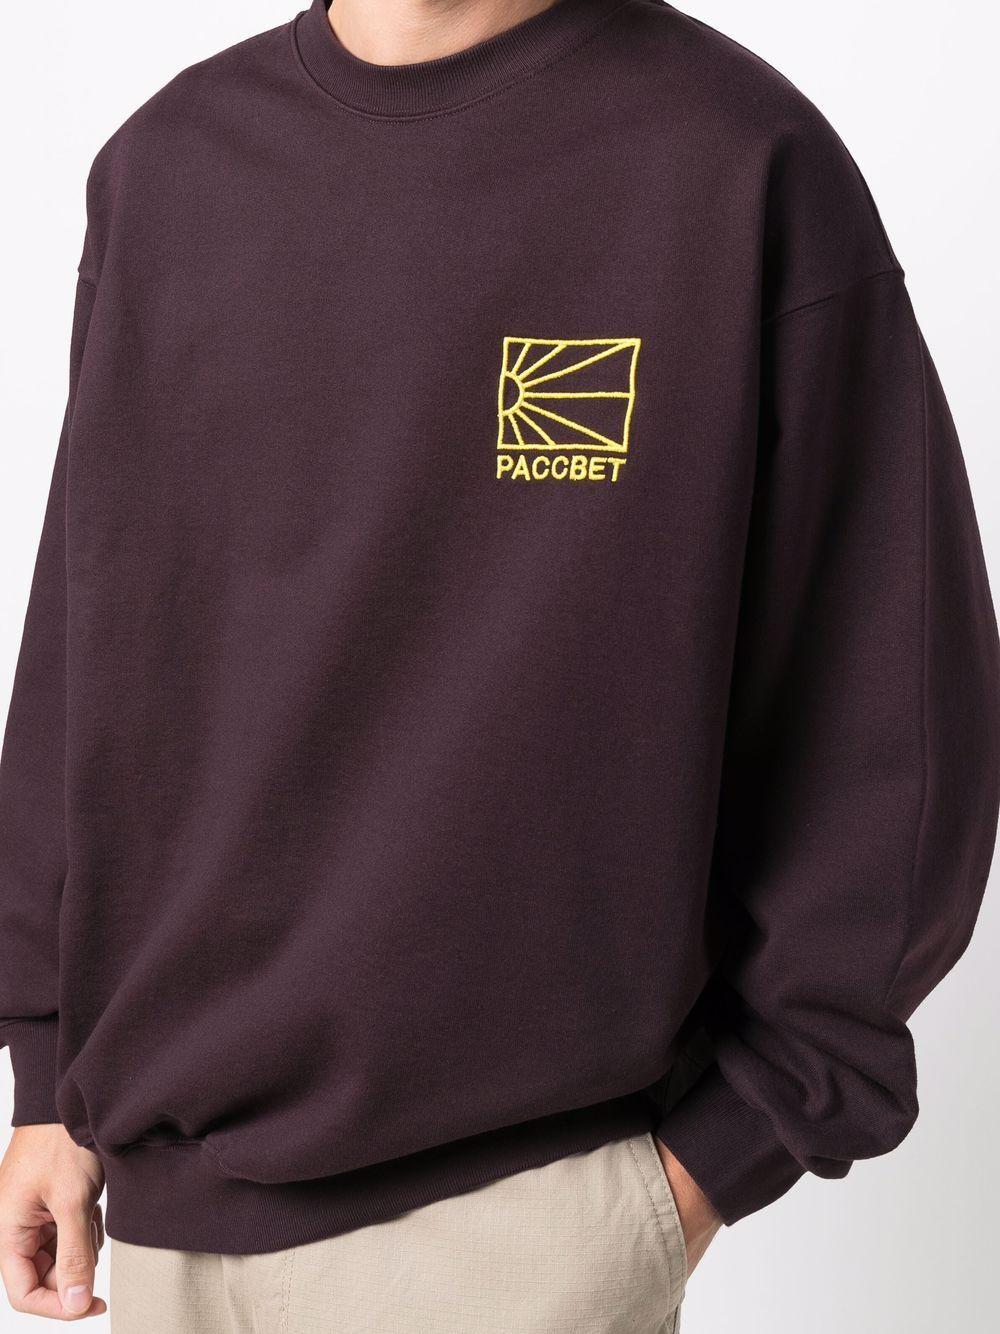 pastel sweatshirt man bordeaux in cotton RASSVET   Sweatshirts   PACC9T0231